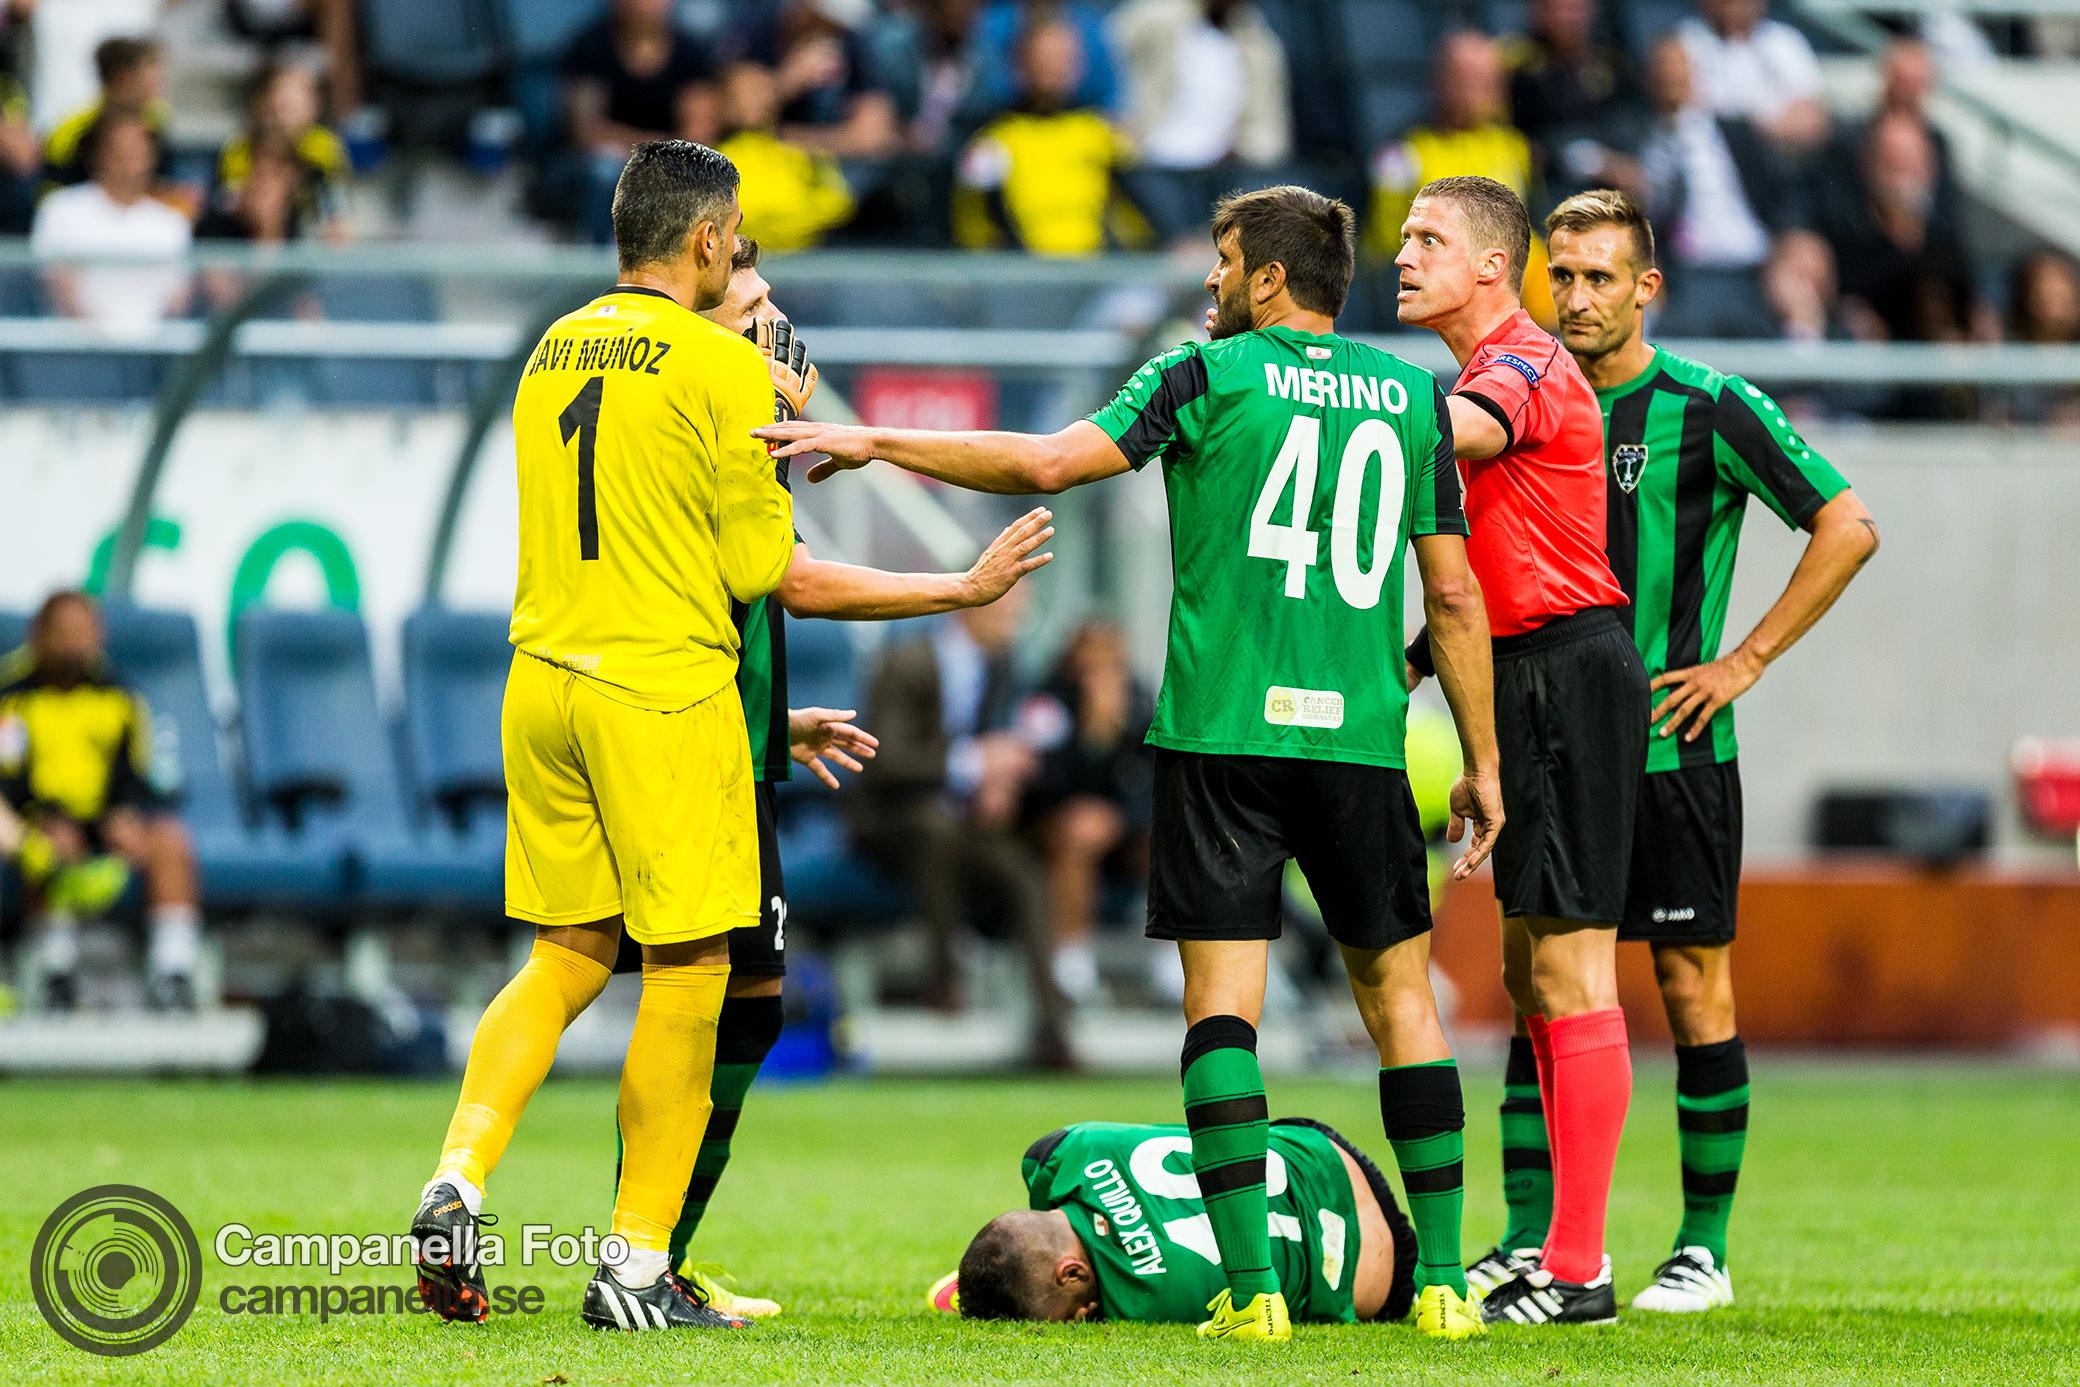 AIK scrapes past Europa FC - Michael Campanella Photography